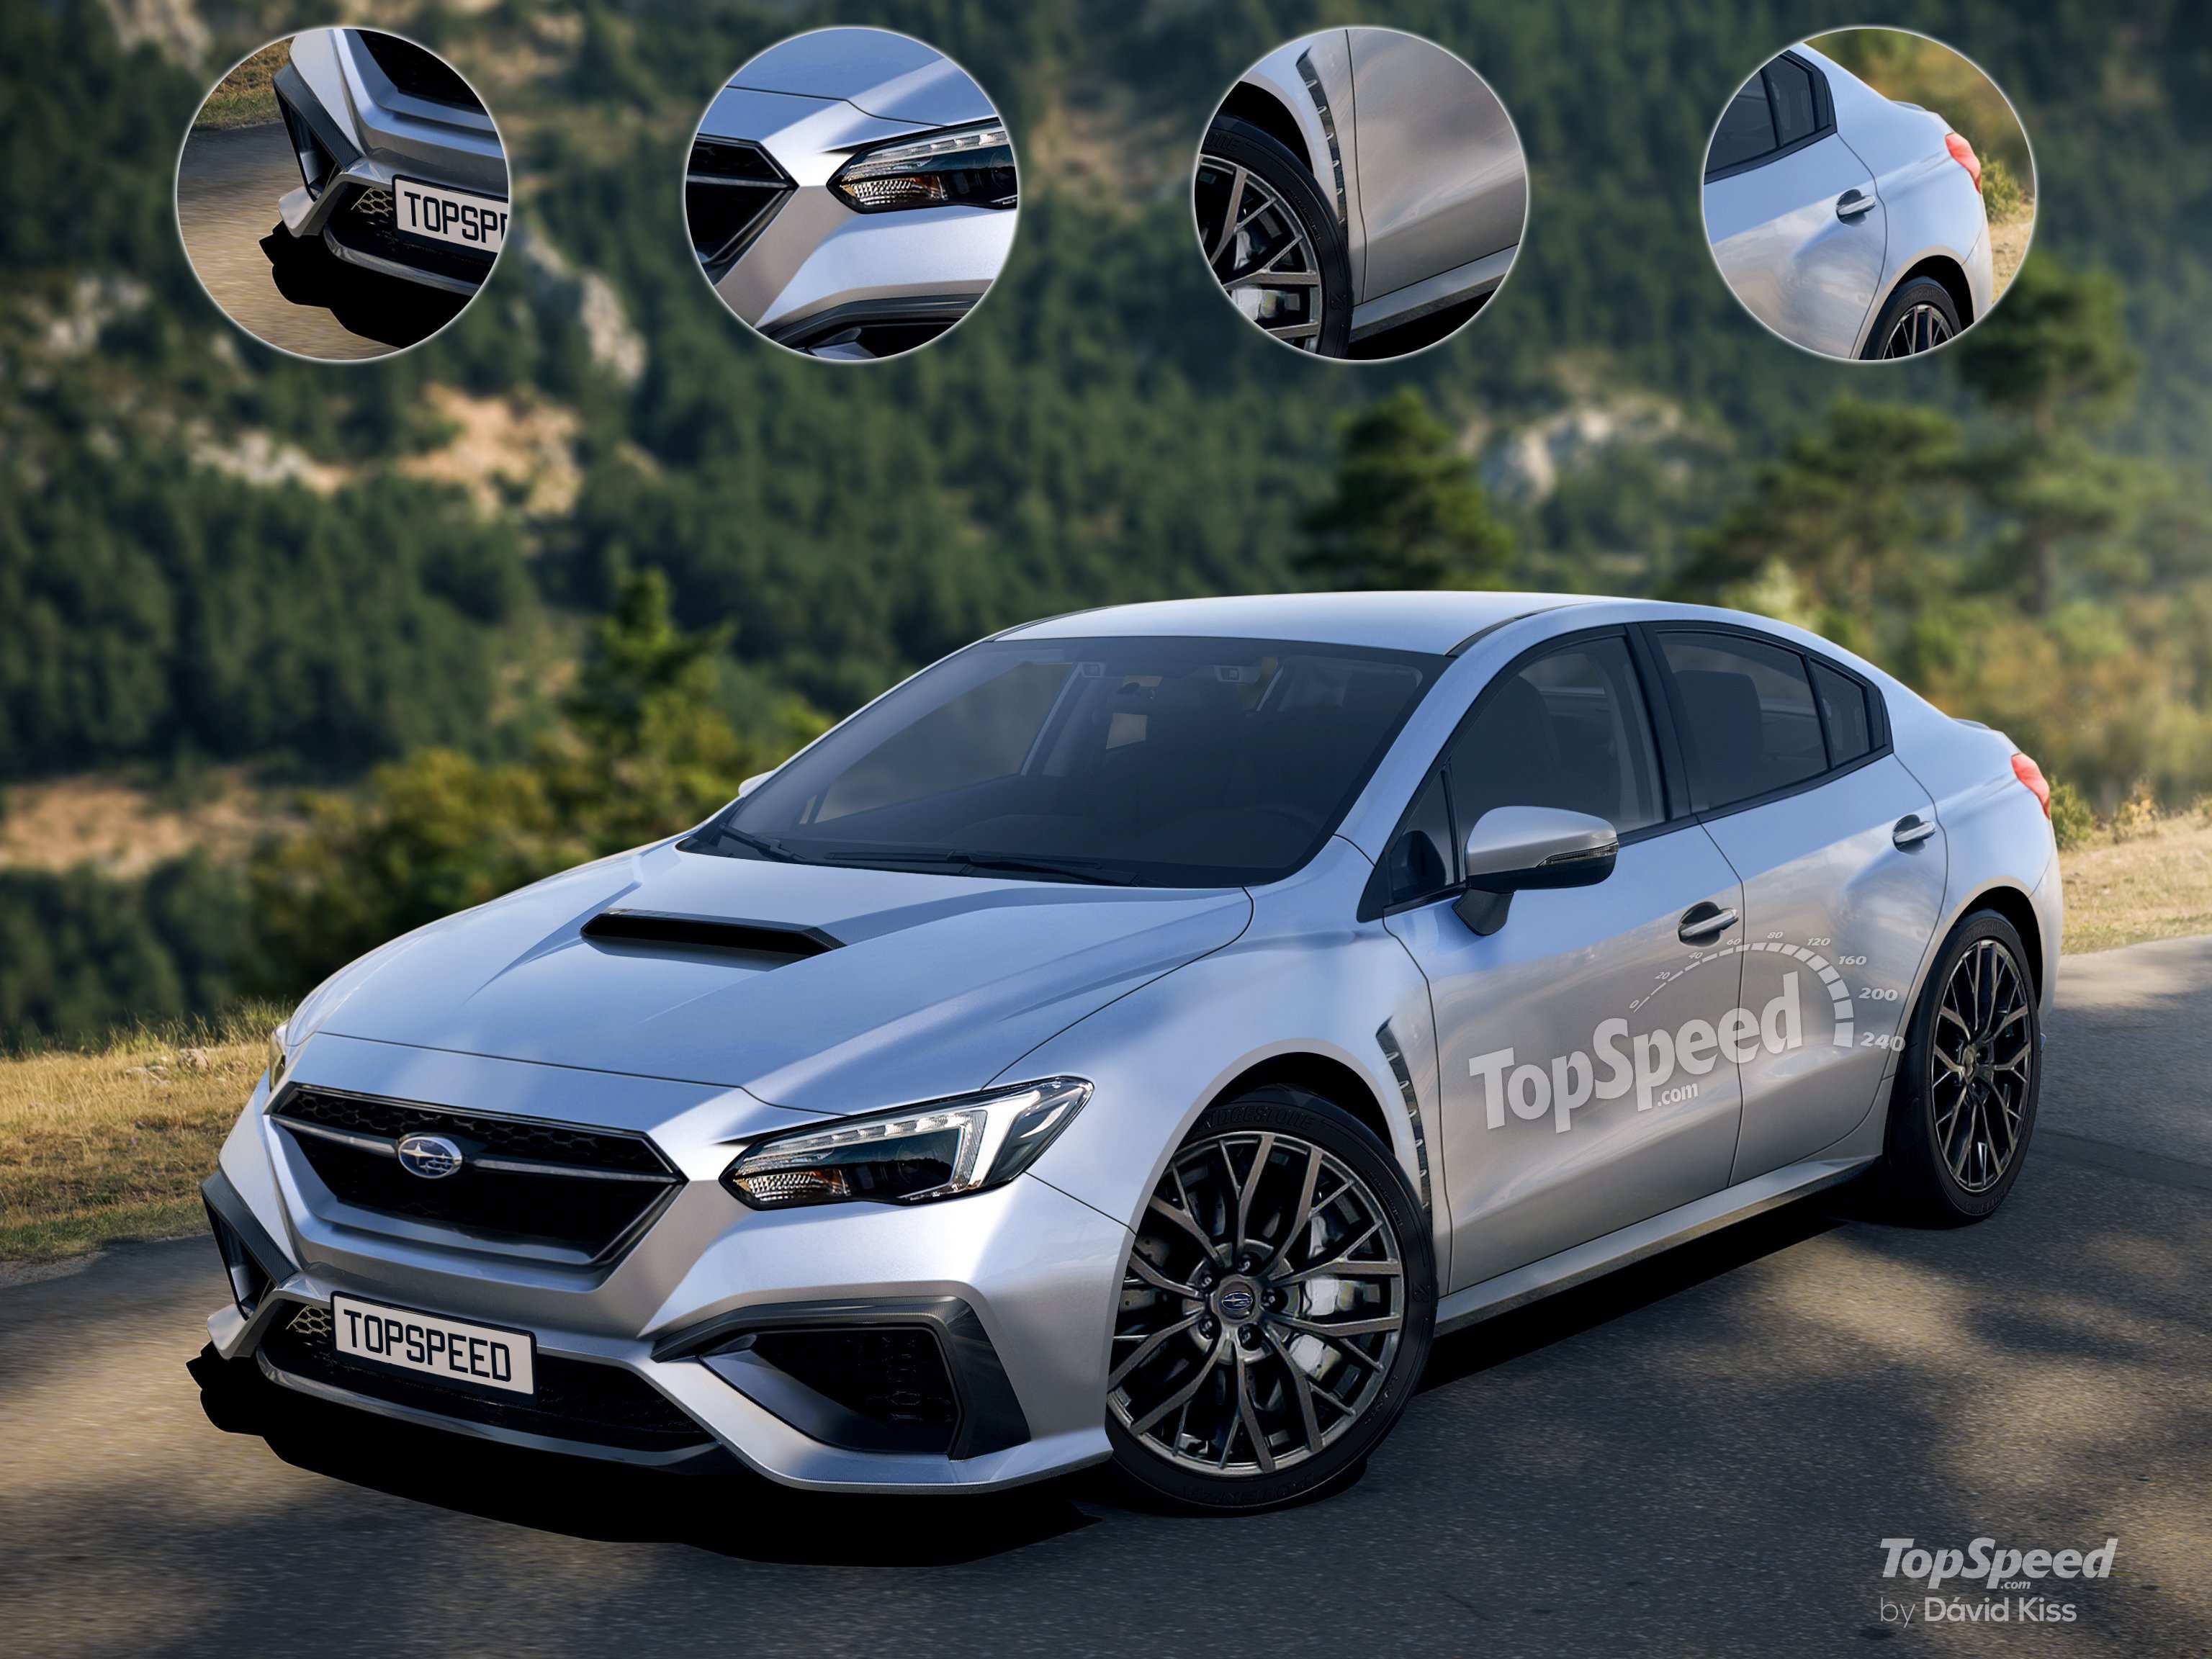 75 New Subaru Sti 2020 Horsepower Performance and New Engine for Subaru Sti 2020 Horsepower